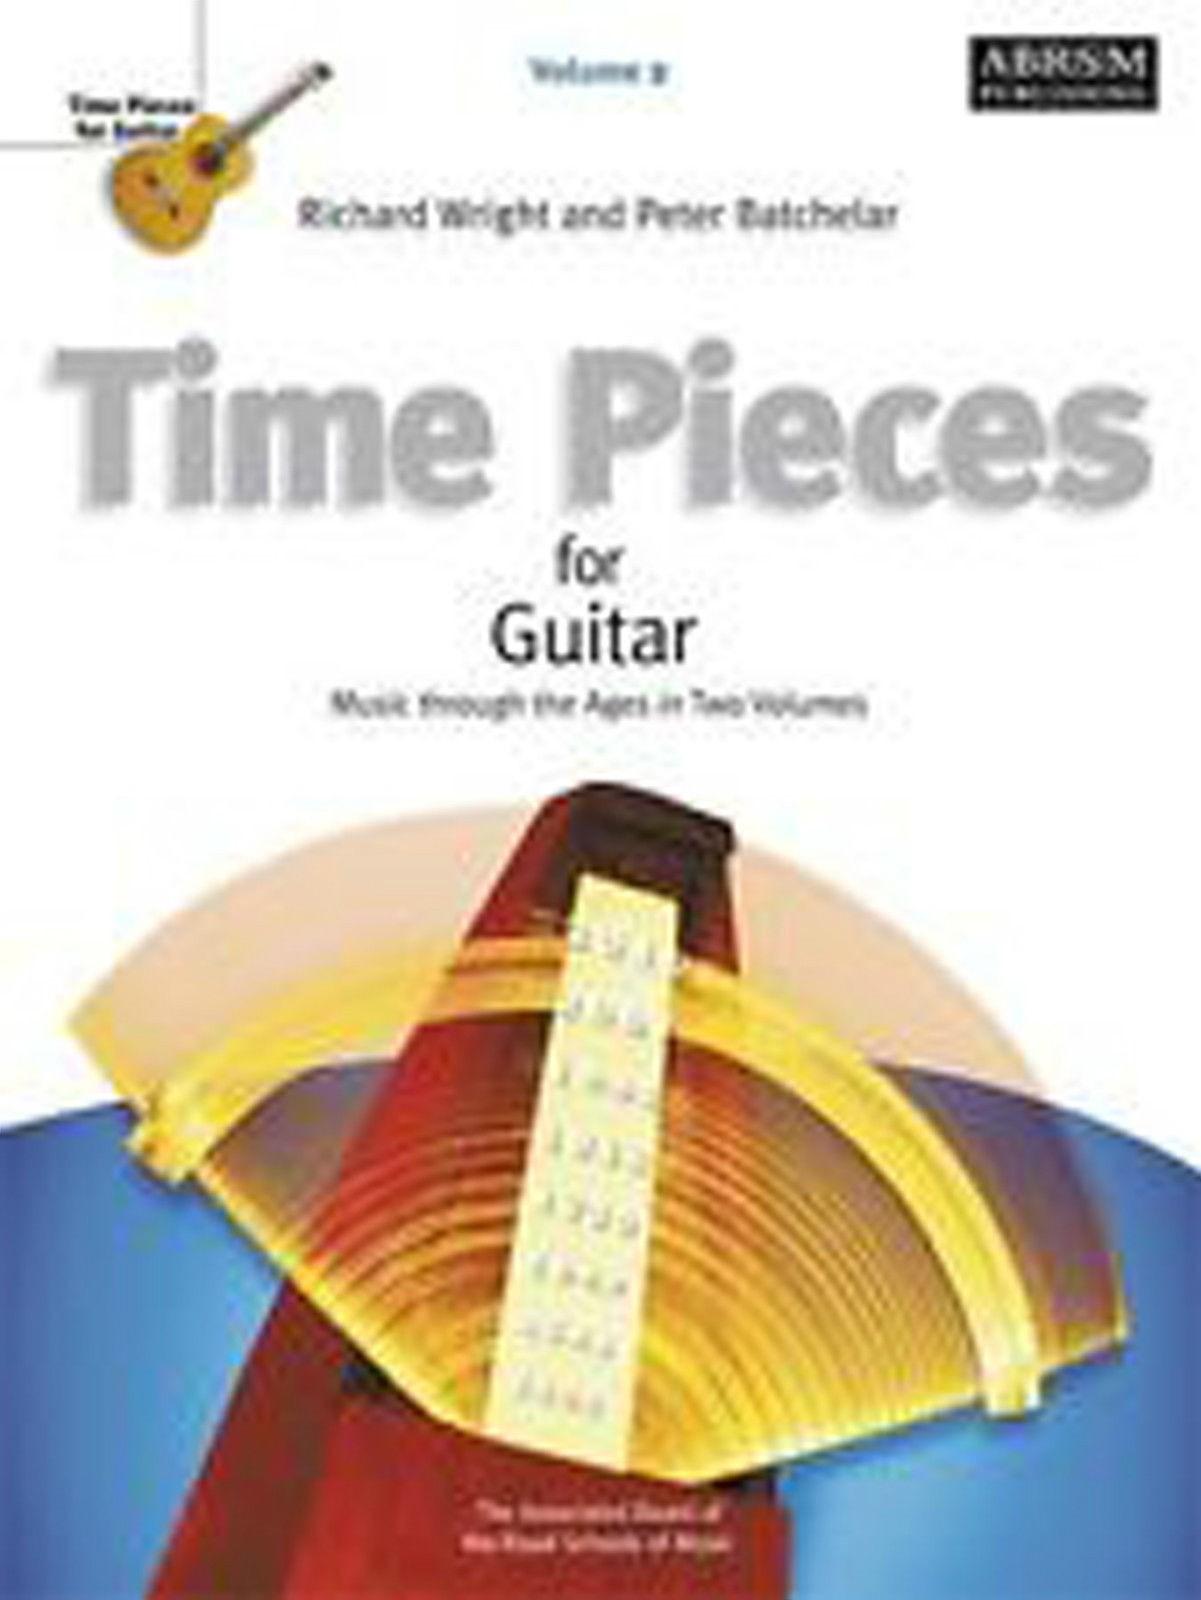 Time Pieces for Guitar Volume 2 ABRSM Grades 3-5 Book Batchelar & Wright B44 S91